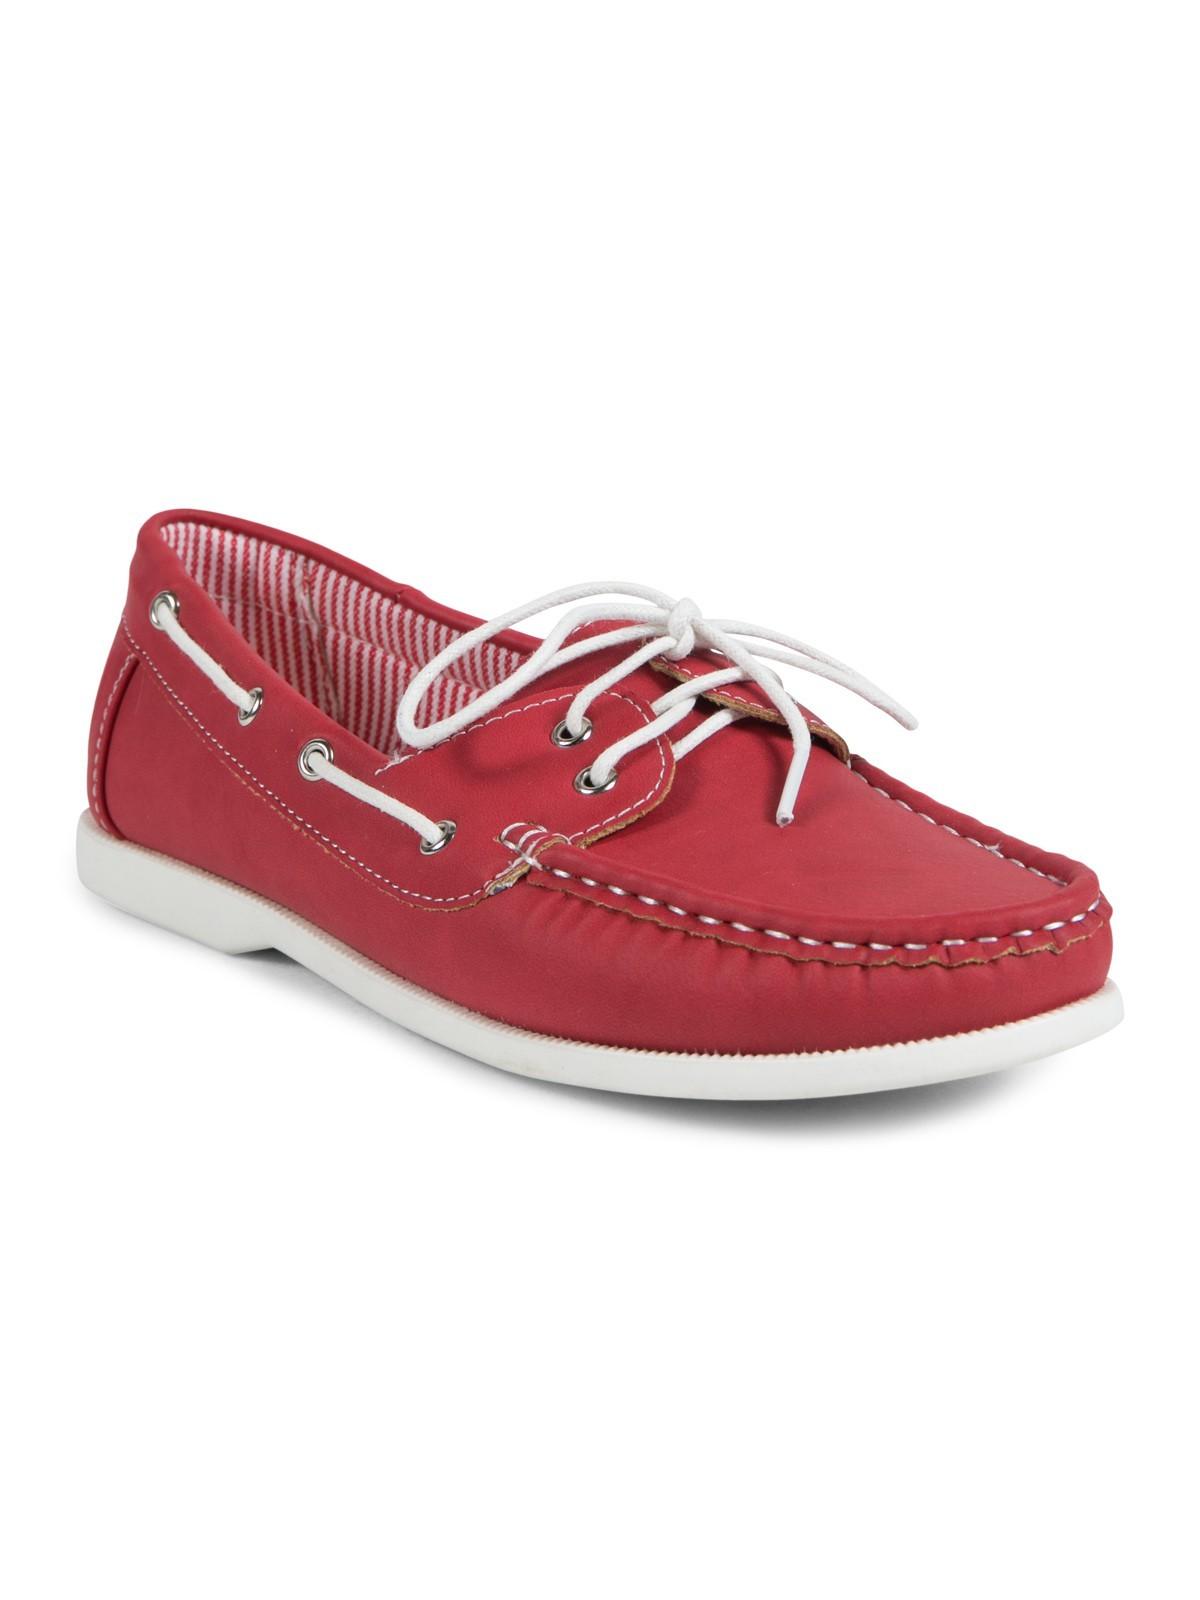 461c1bd1fa7 Chaussure bateau femme rouge (36-41) - DistriCenter